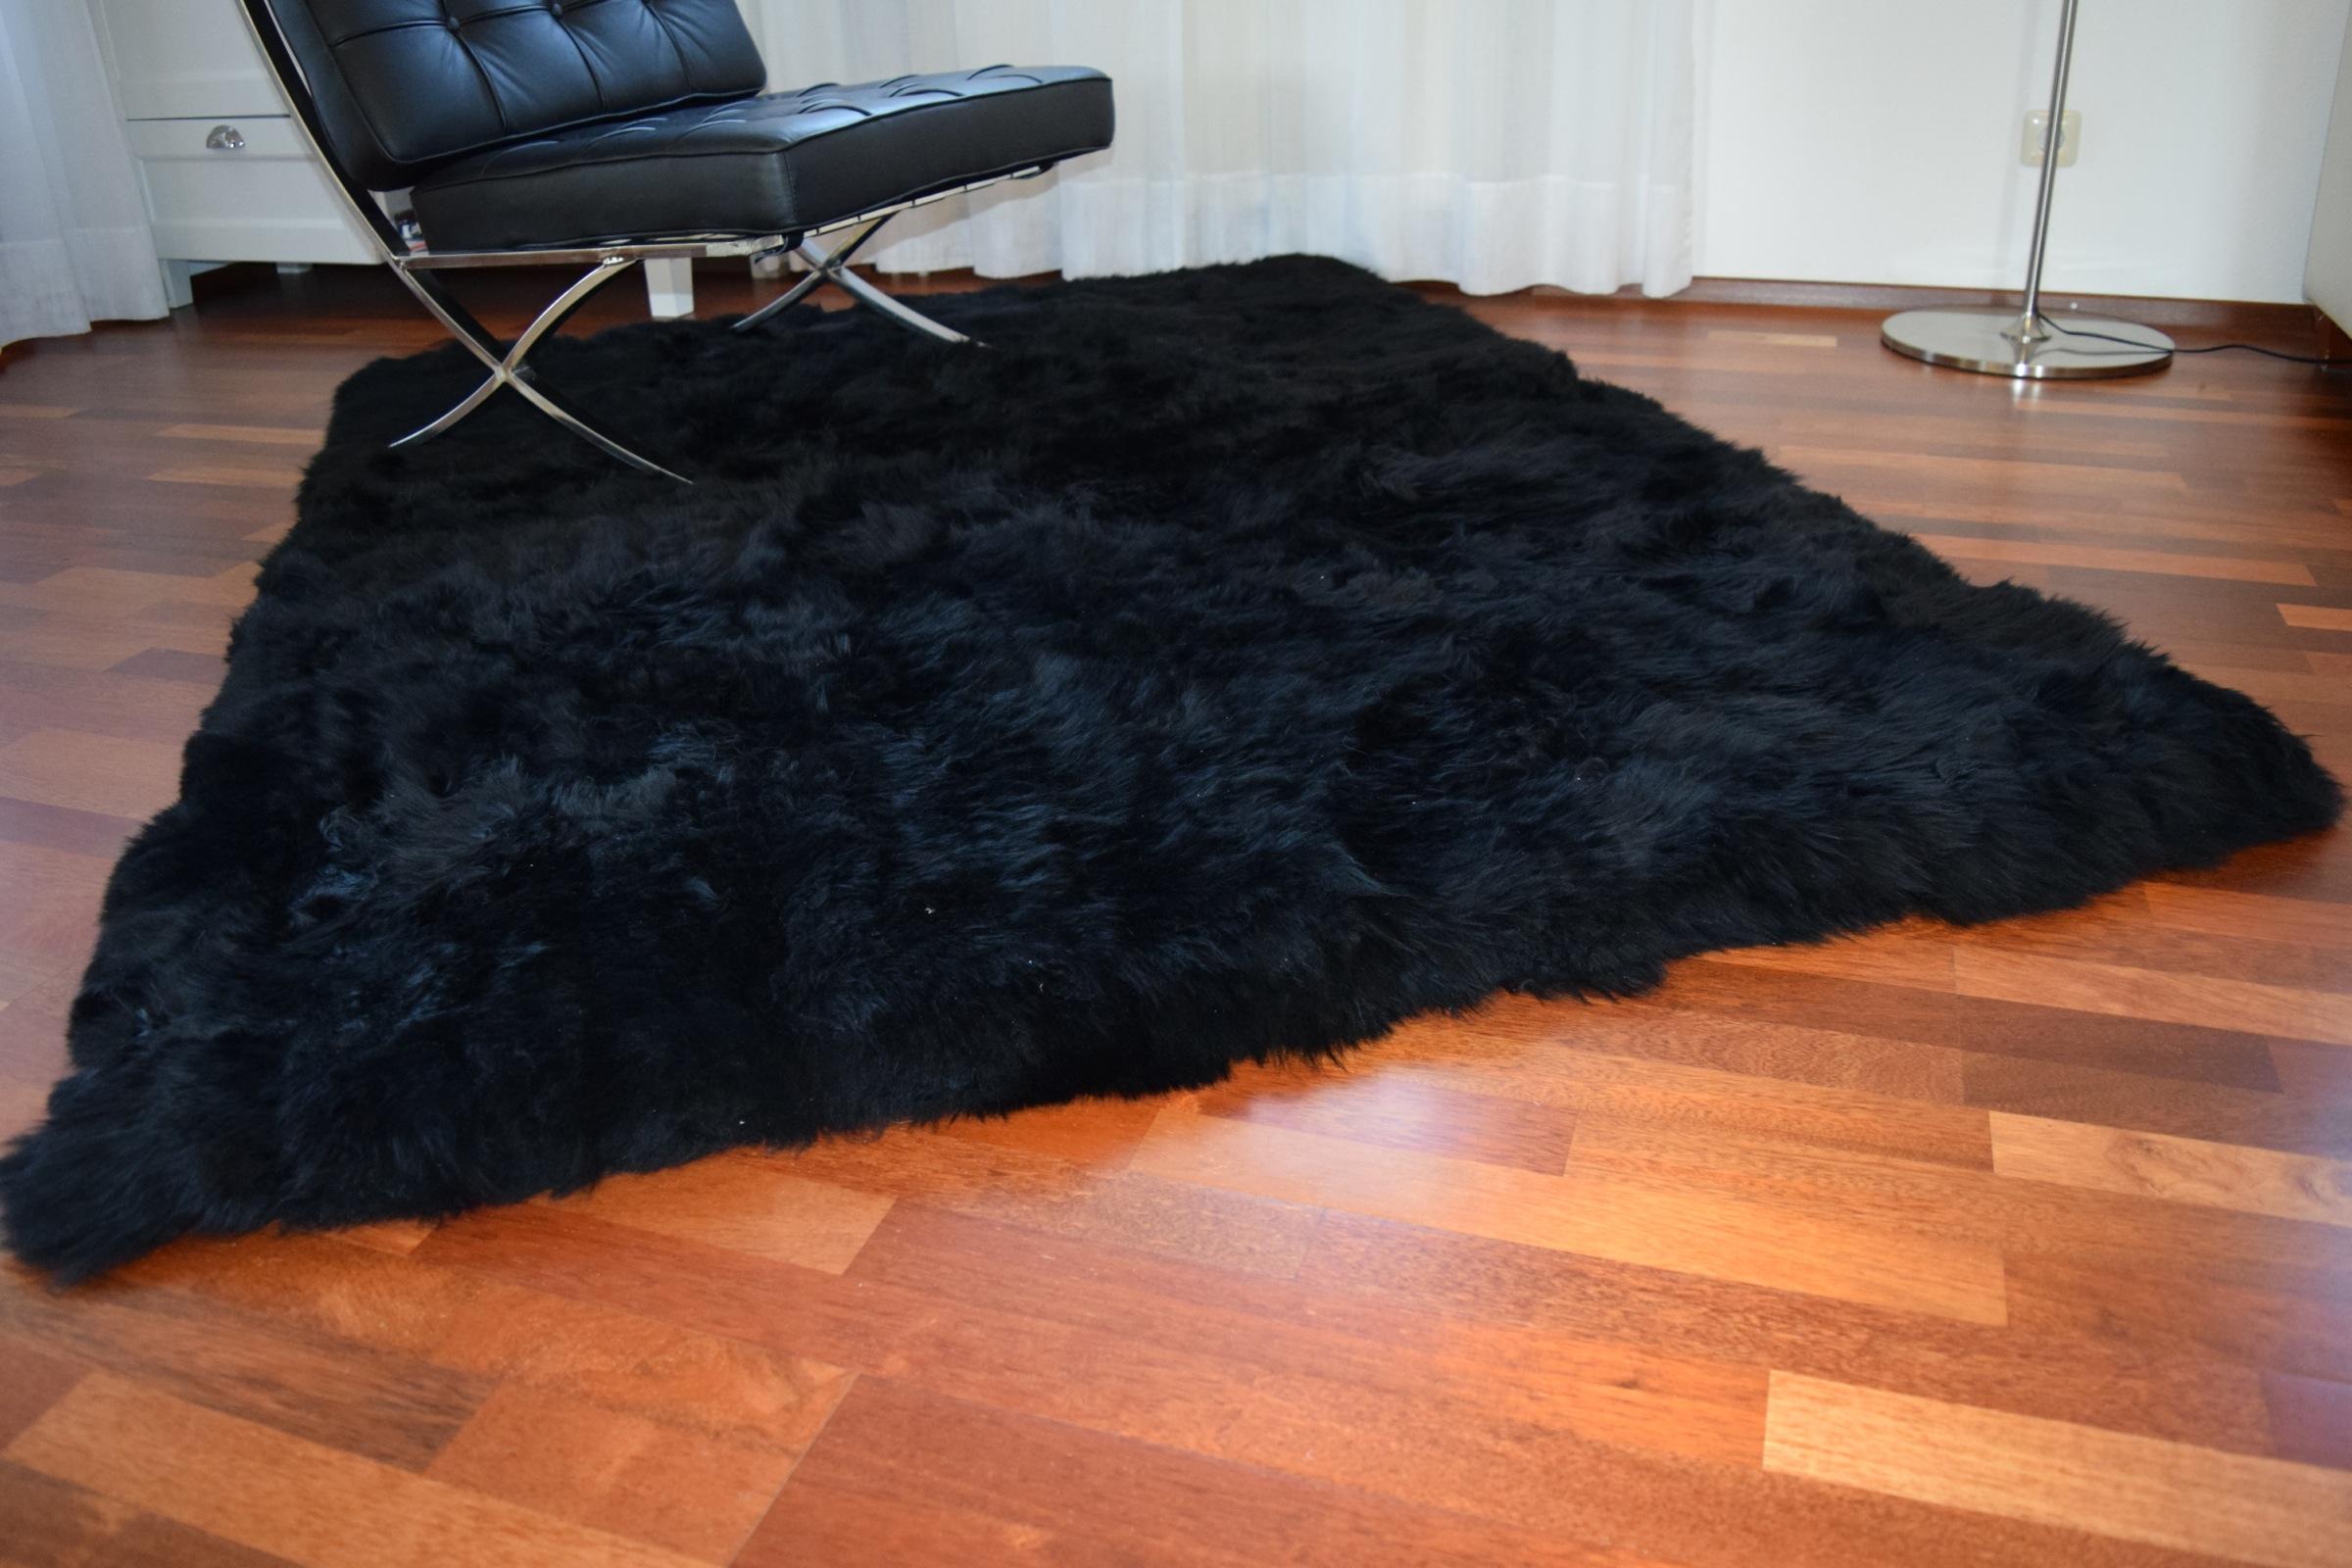 naturasan designer ko schaffell lammfell teppich hochflor langflor retro ca 160 x 230 cm. Black Bedroom Furniture Sets. Home Design Ideas